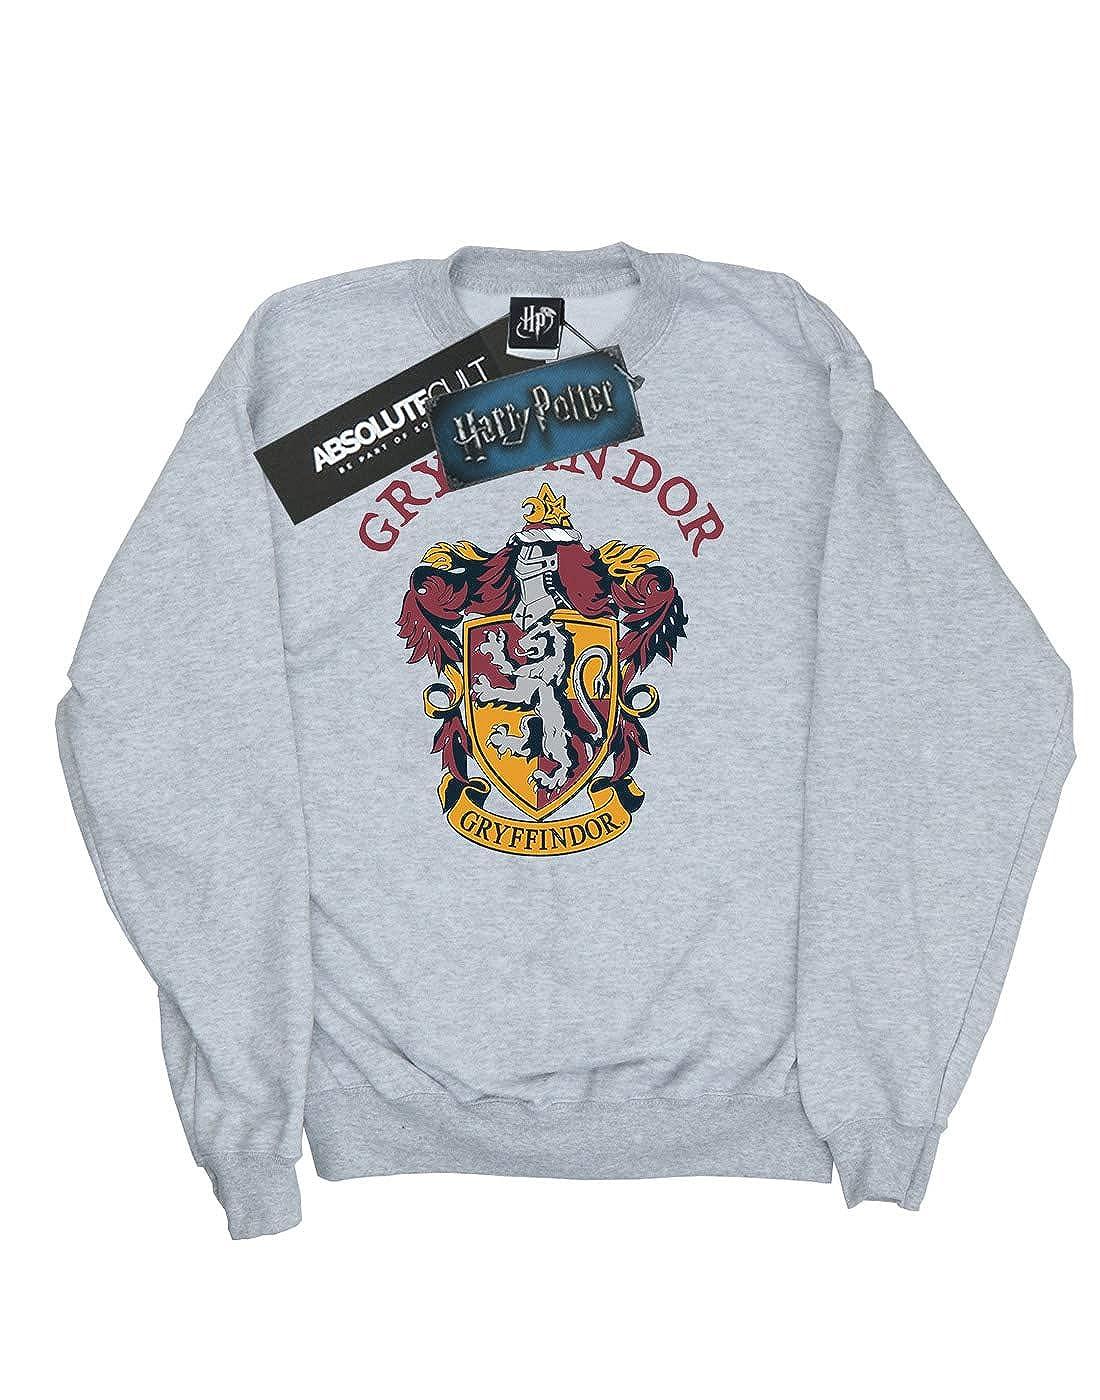 HARRY POTTER ni/ños Gryffindor Distressed Crest Camisa De Entrenamiento 12-13 Years Oscuro Heather